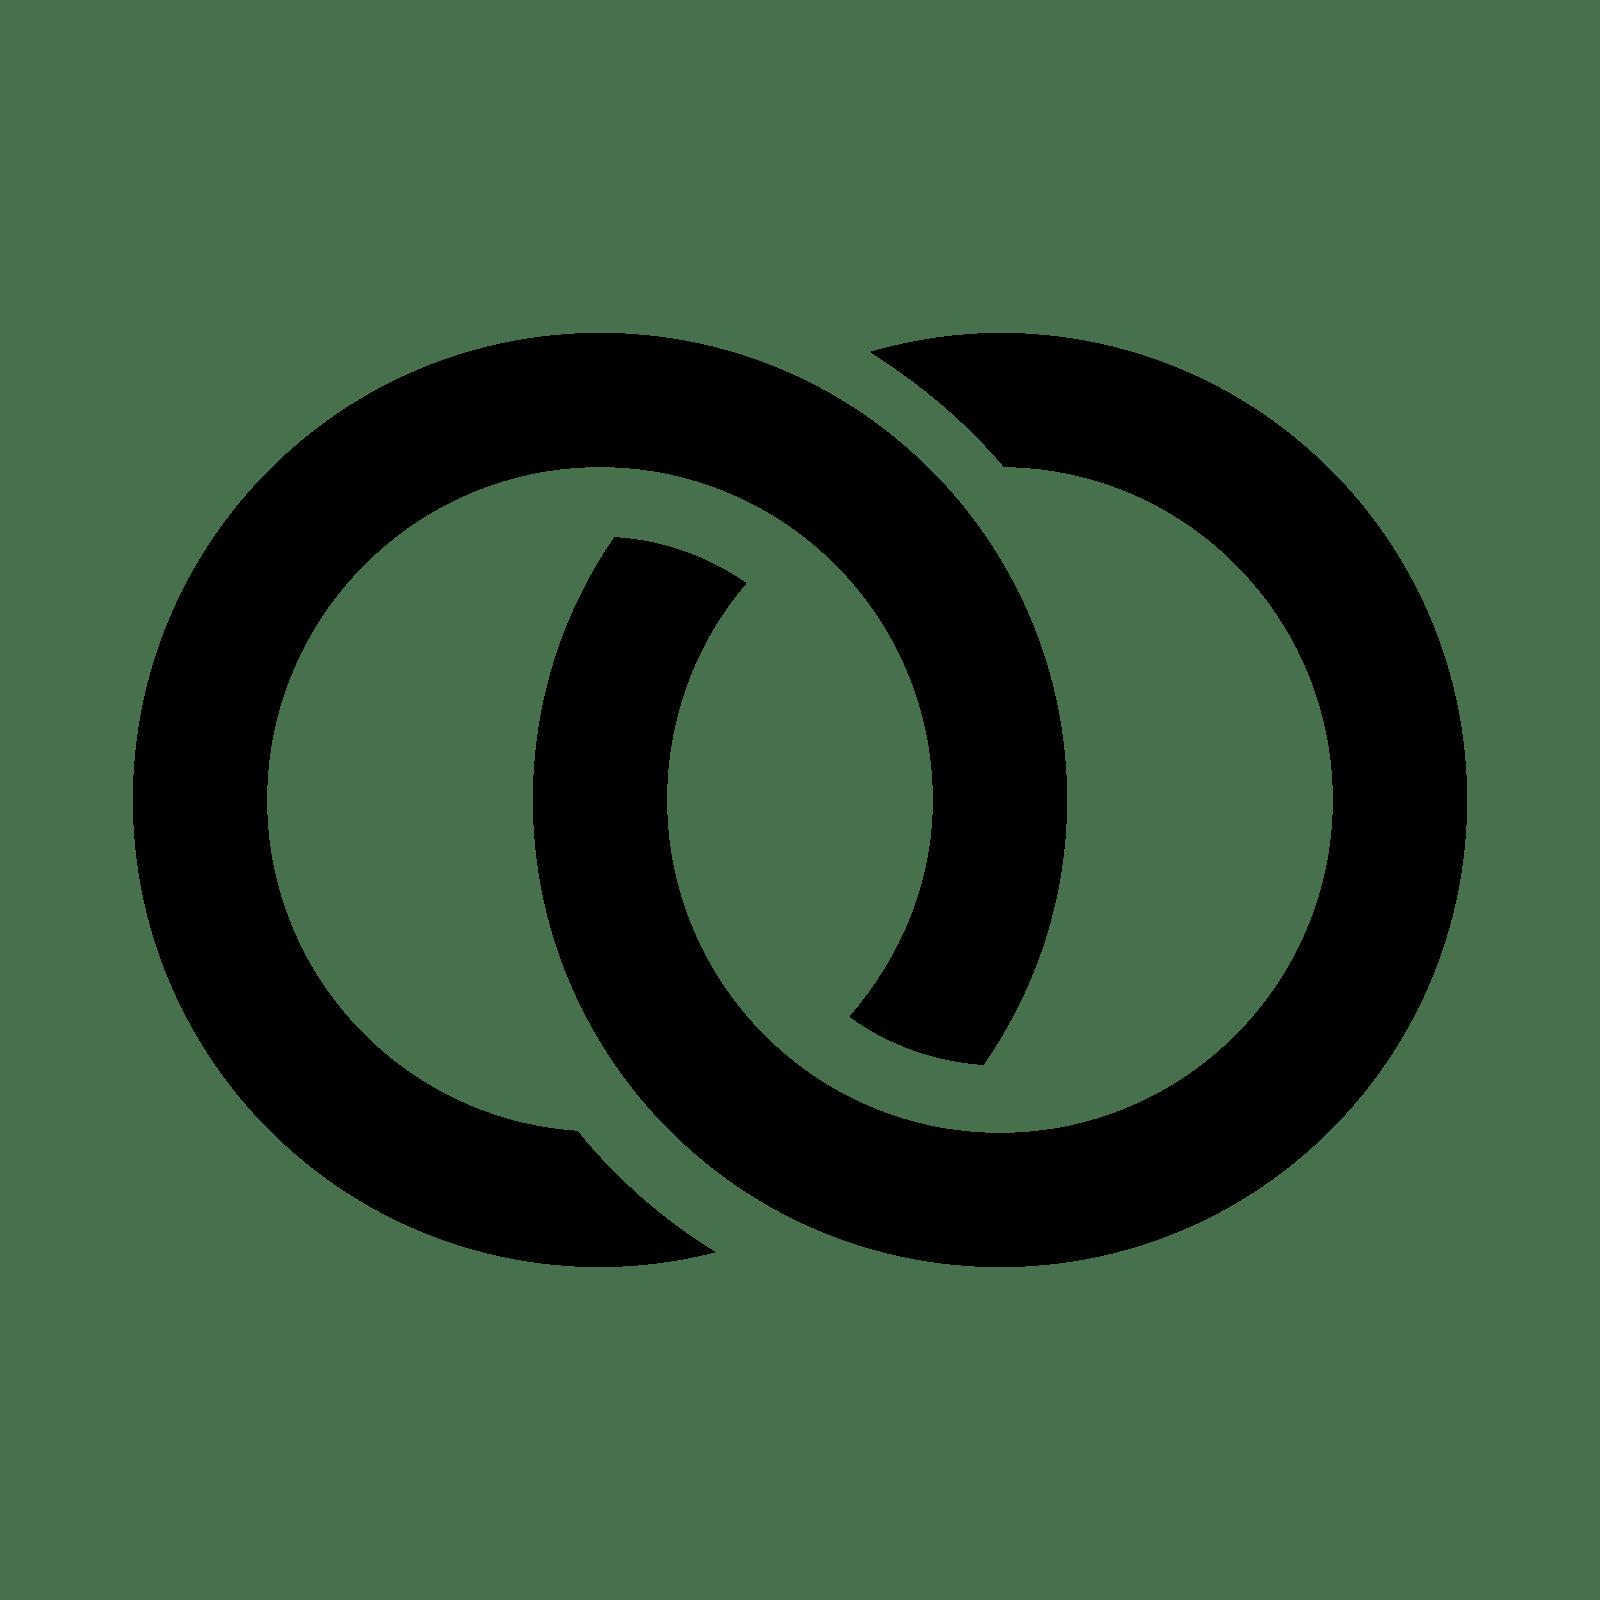 Eheringe Icon - Eheringe Symbol PNG